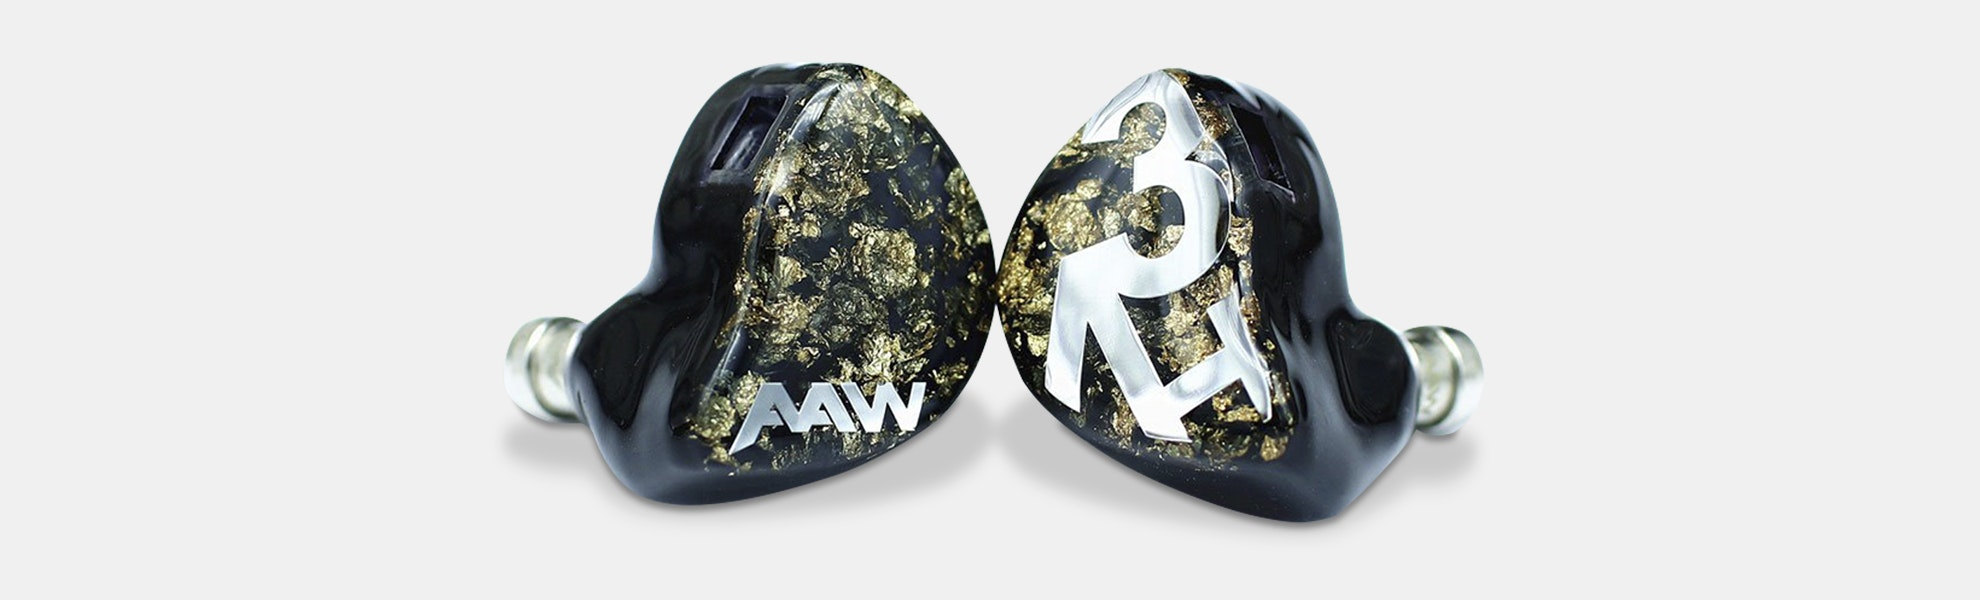 AAW A3H, AXH & ASH IEMs